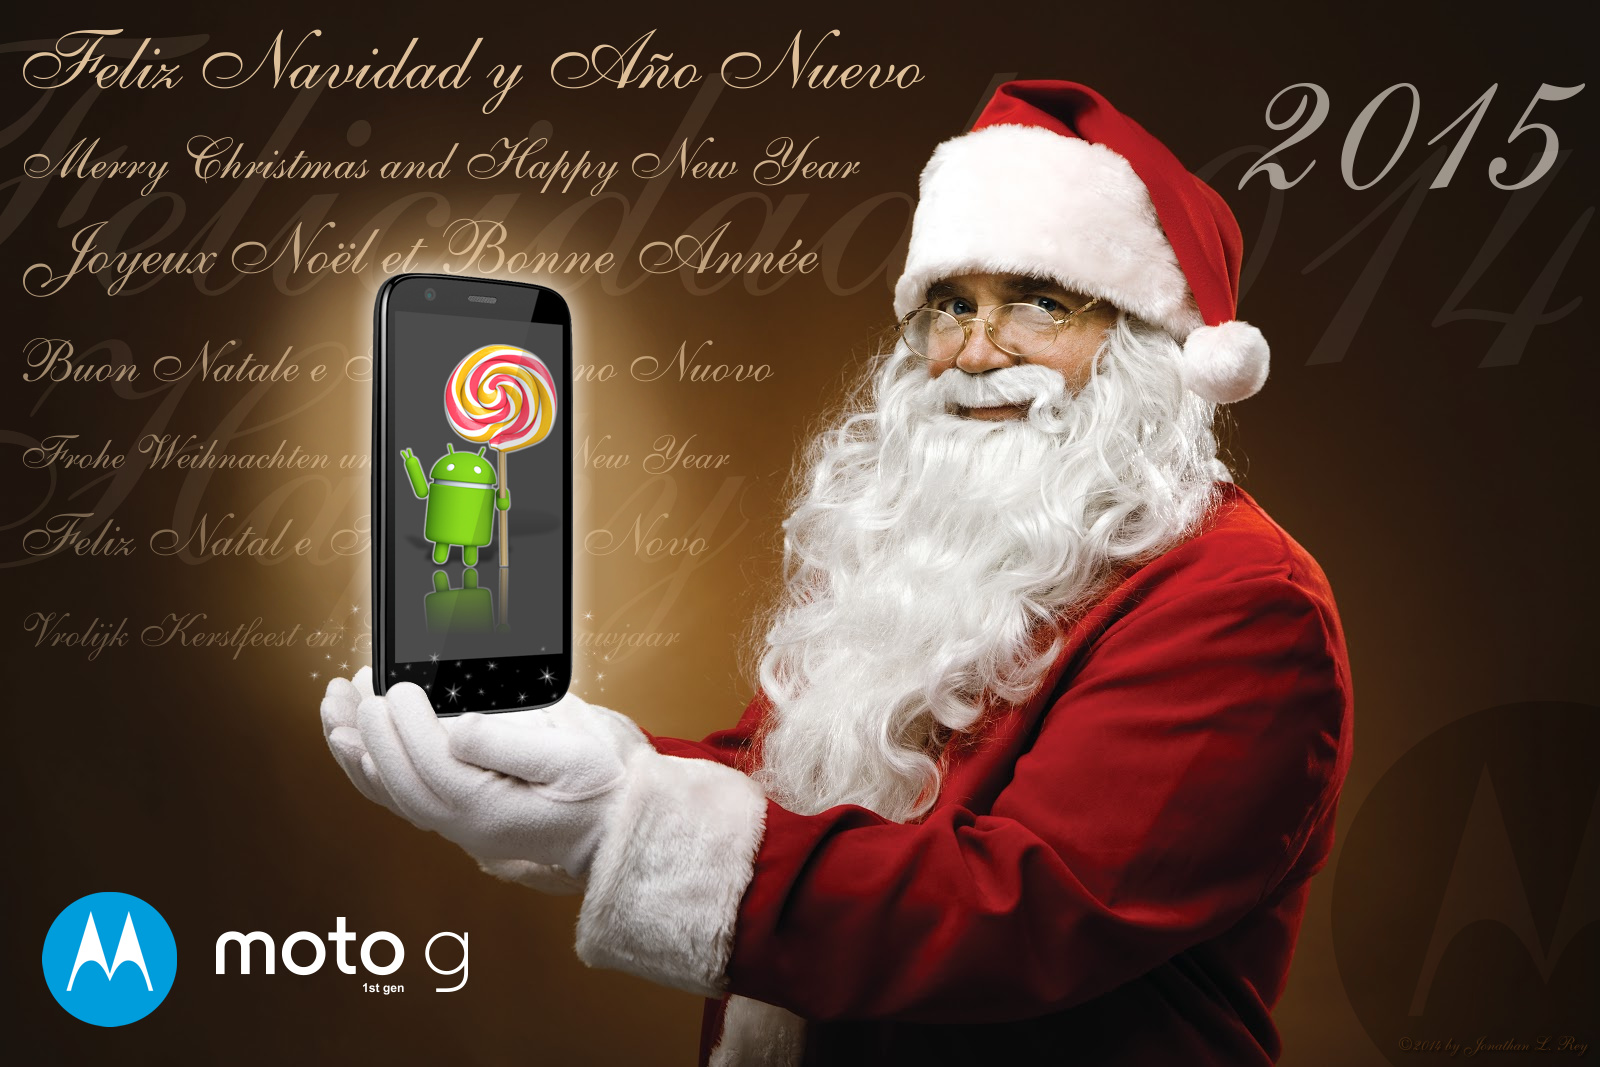 Moto G 1st Gen - Santa Gift Android Lollipop 5 by jonathanrey